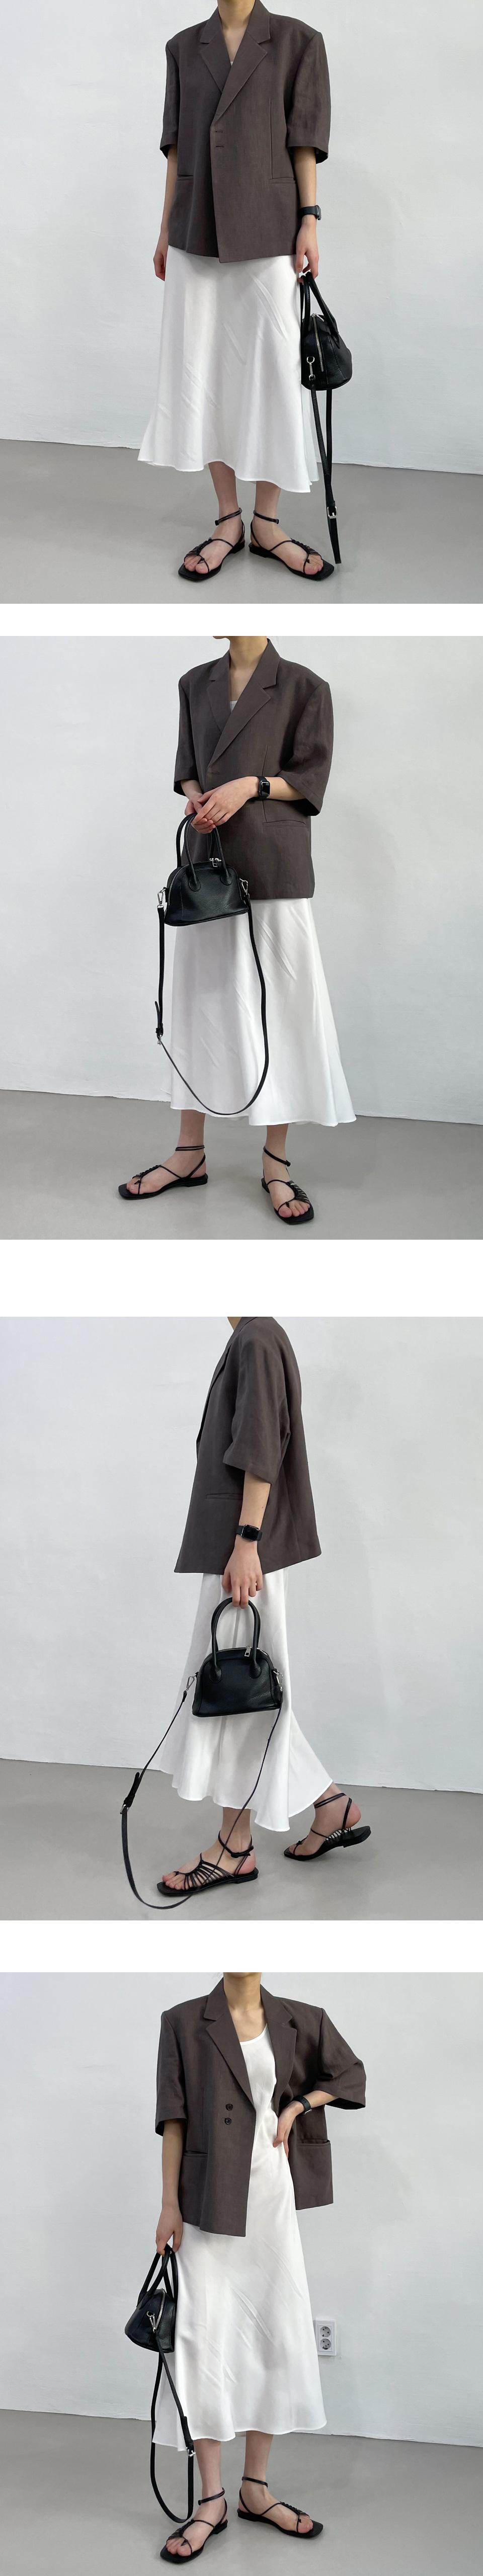 Modit Long Sleeveless Dress